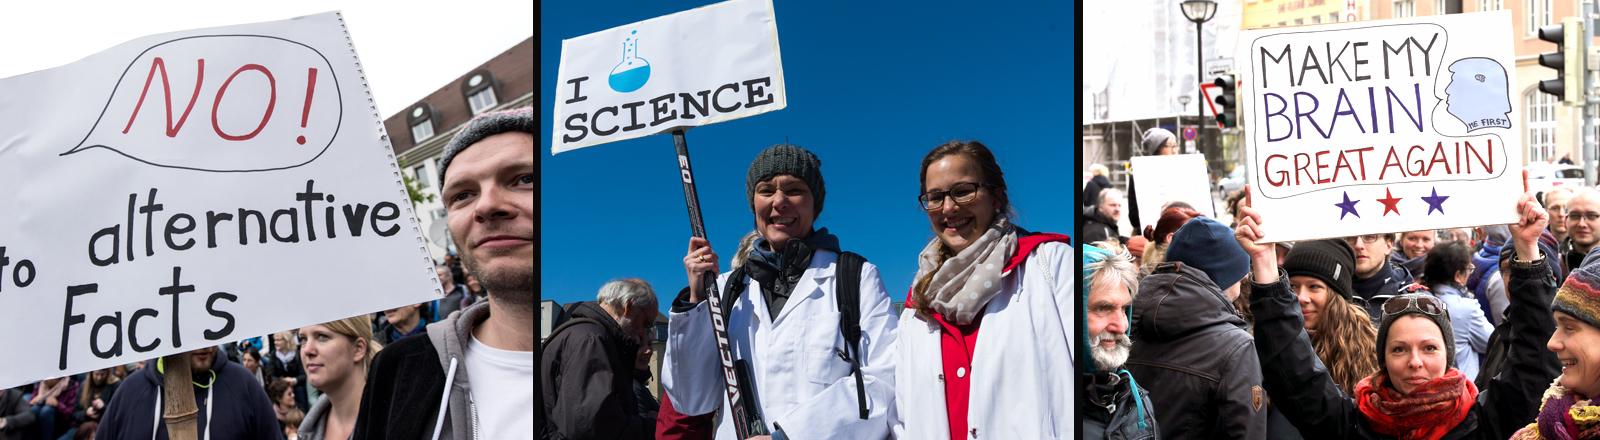 March for Science - Wissenschaftler protestieren die Wissenschaften.